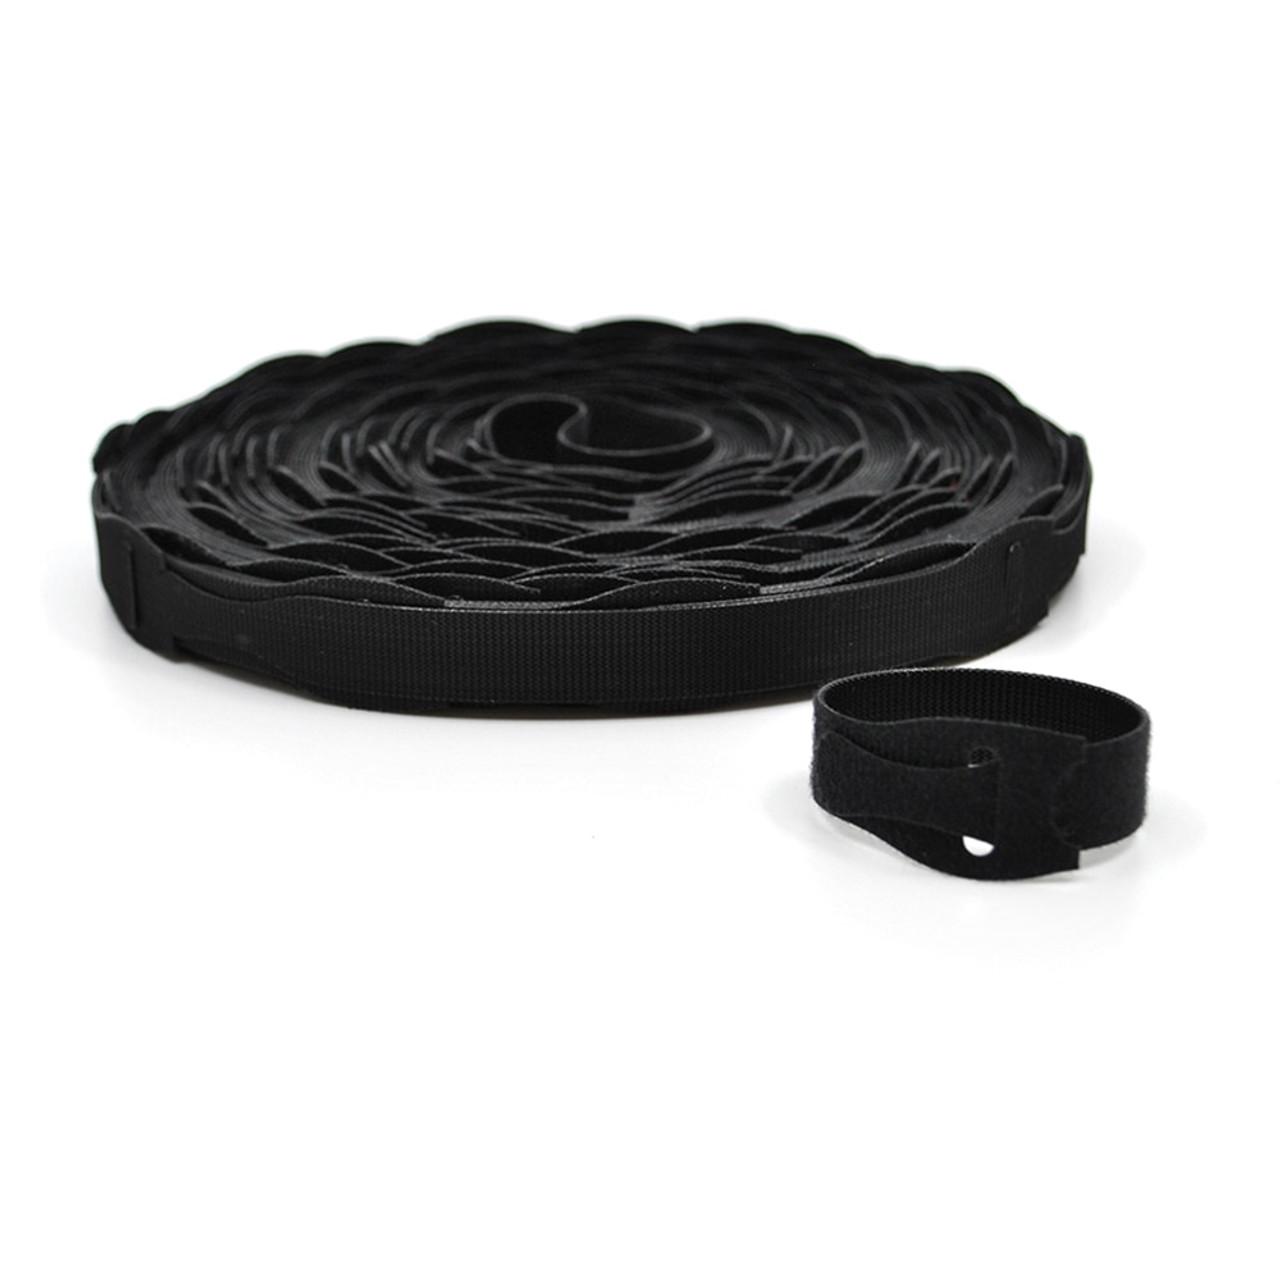 VELCRO® Brand QWIK Tie Die-Cut Straps Black / Velcro Straps - Bundling Straps - Velcro Tie - Velcro Strap